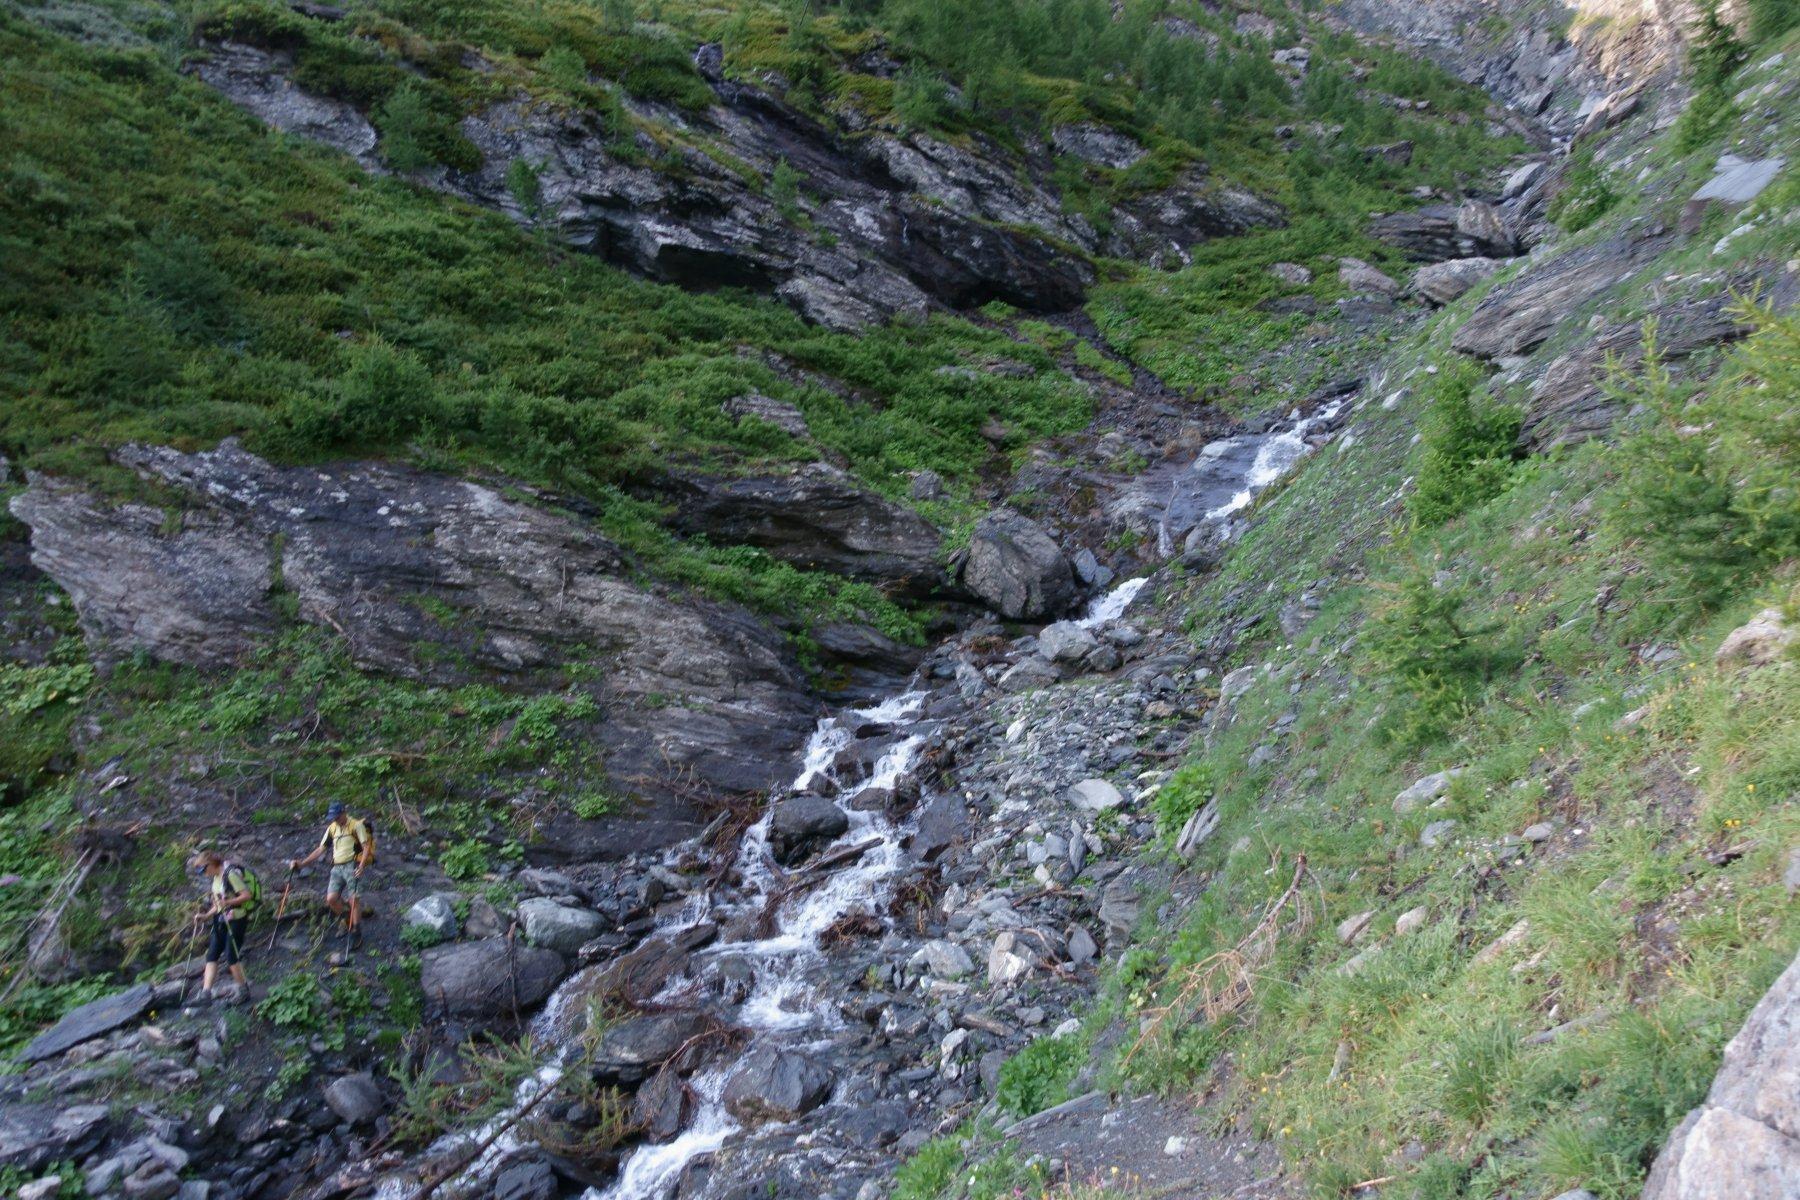 L'attraversamento del torrente